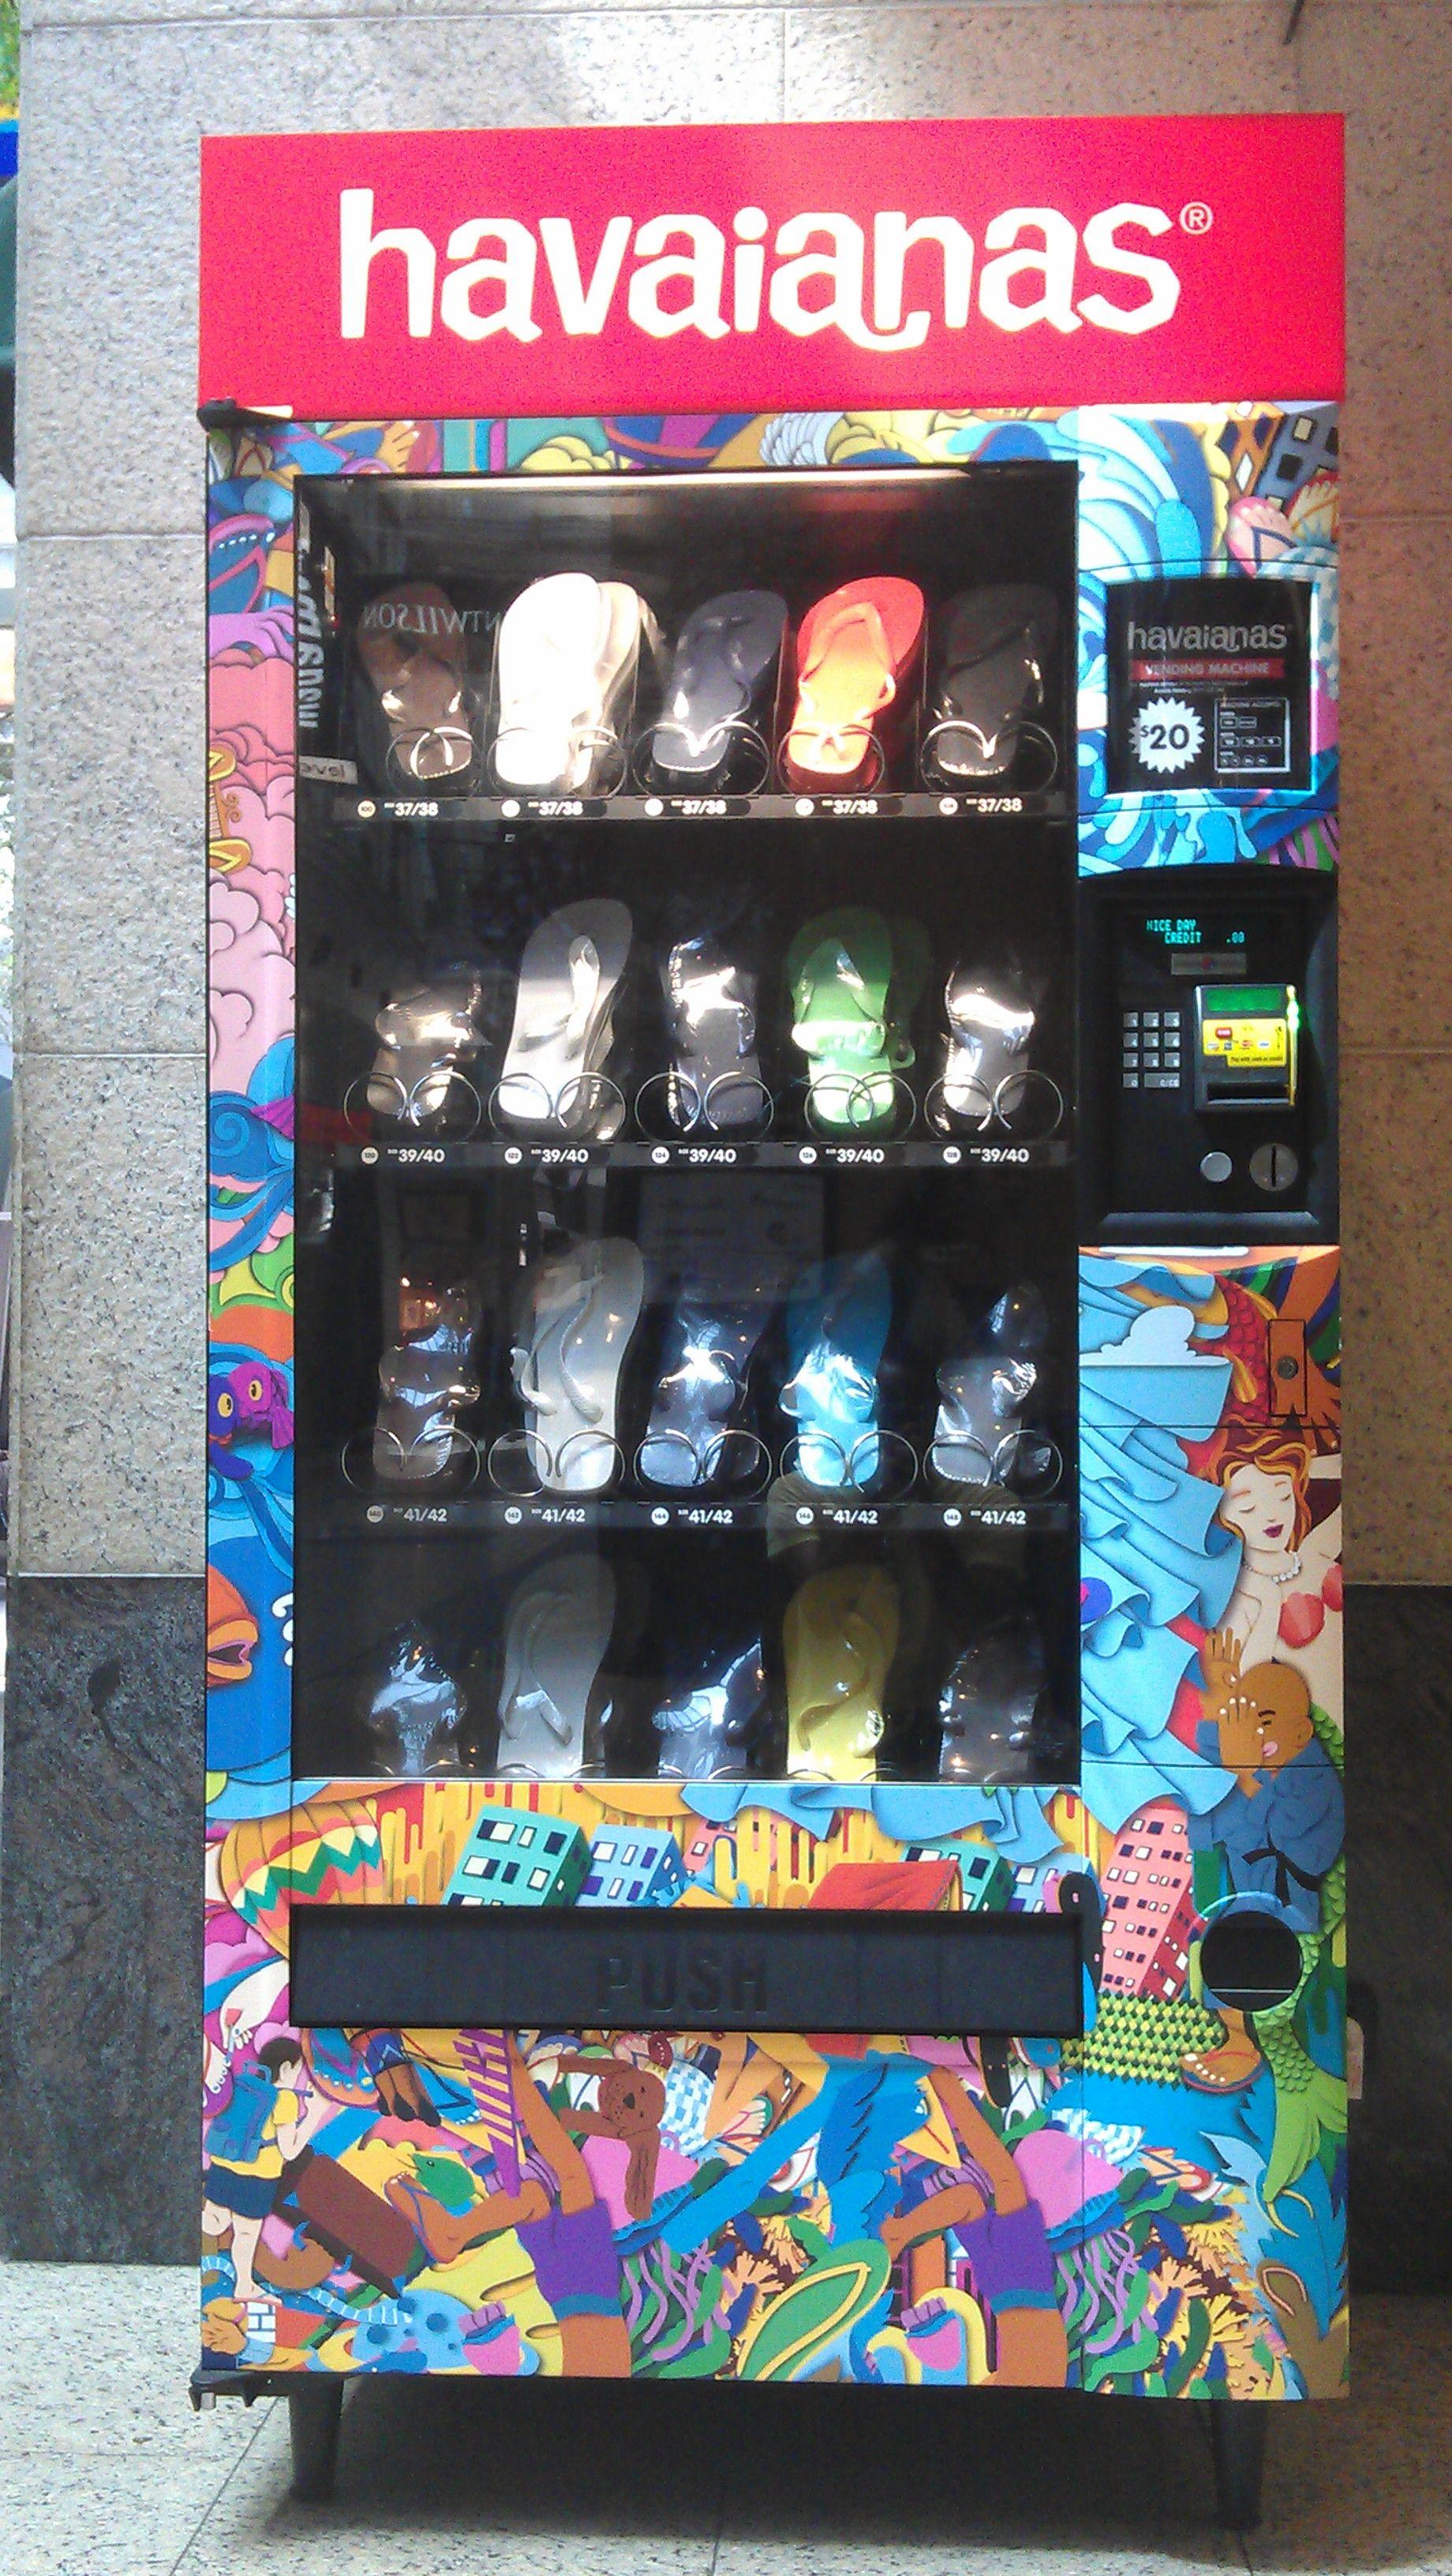 Hair accessories vending machines - Havaianas Vending Machine In Australia I Wanna Go There So Bad